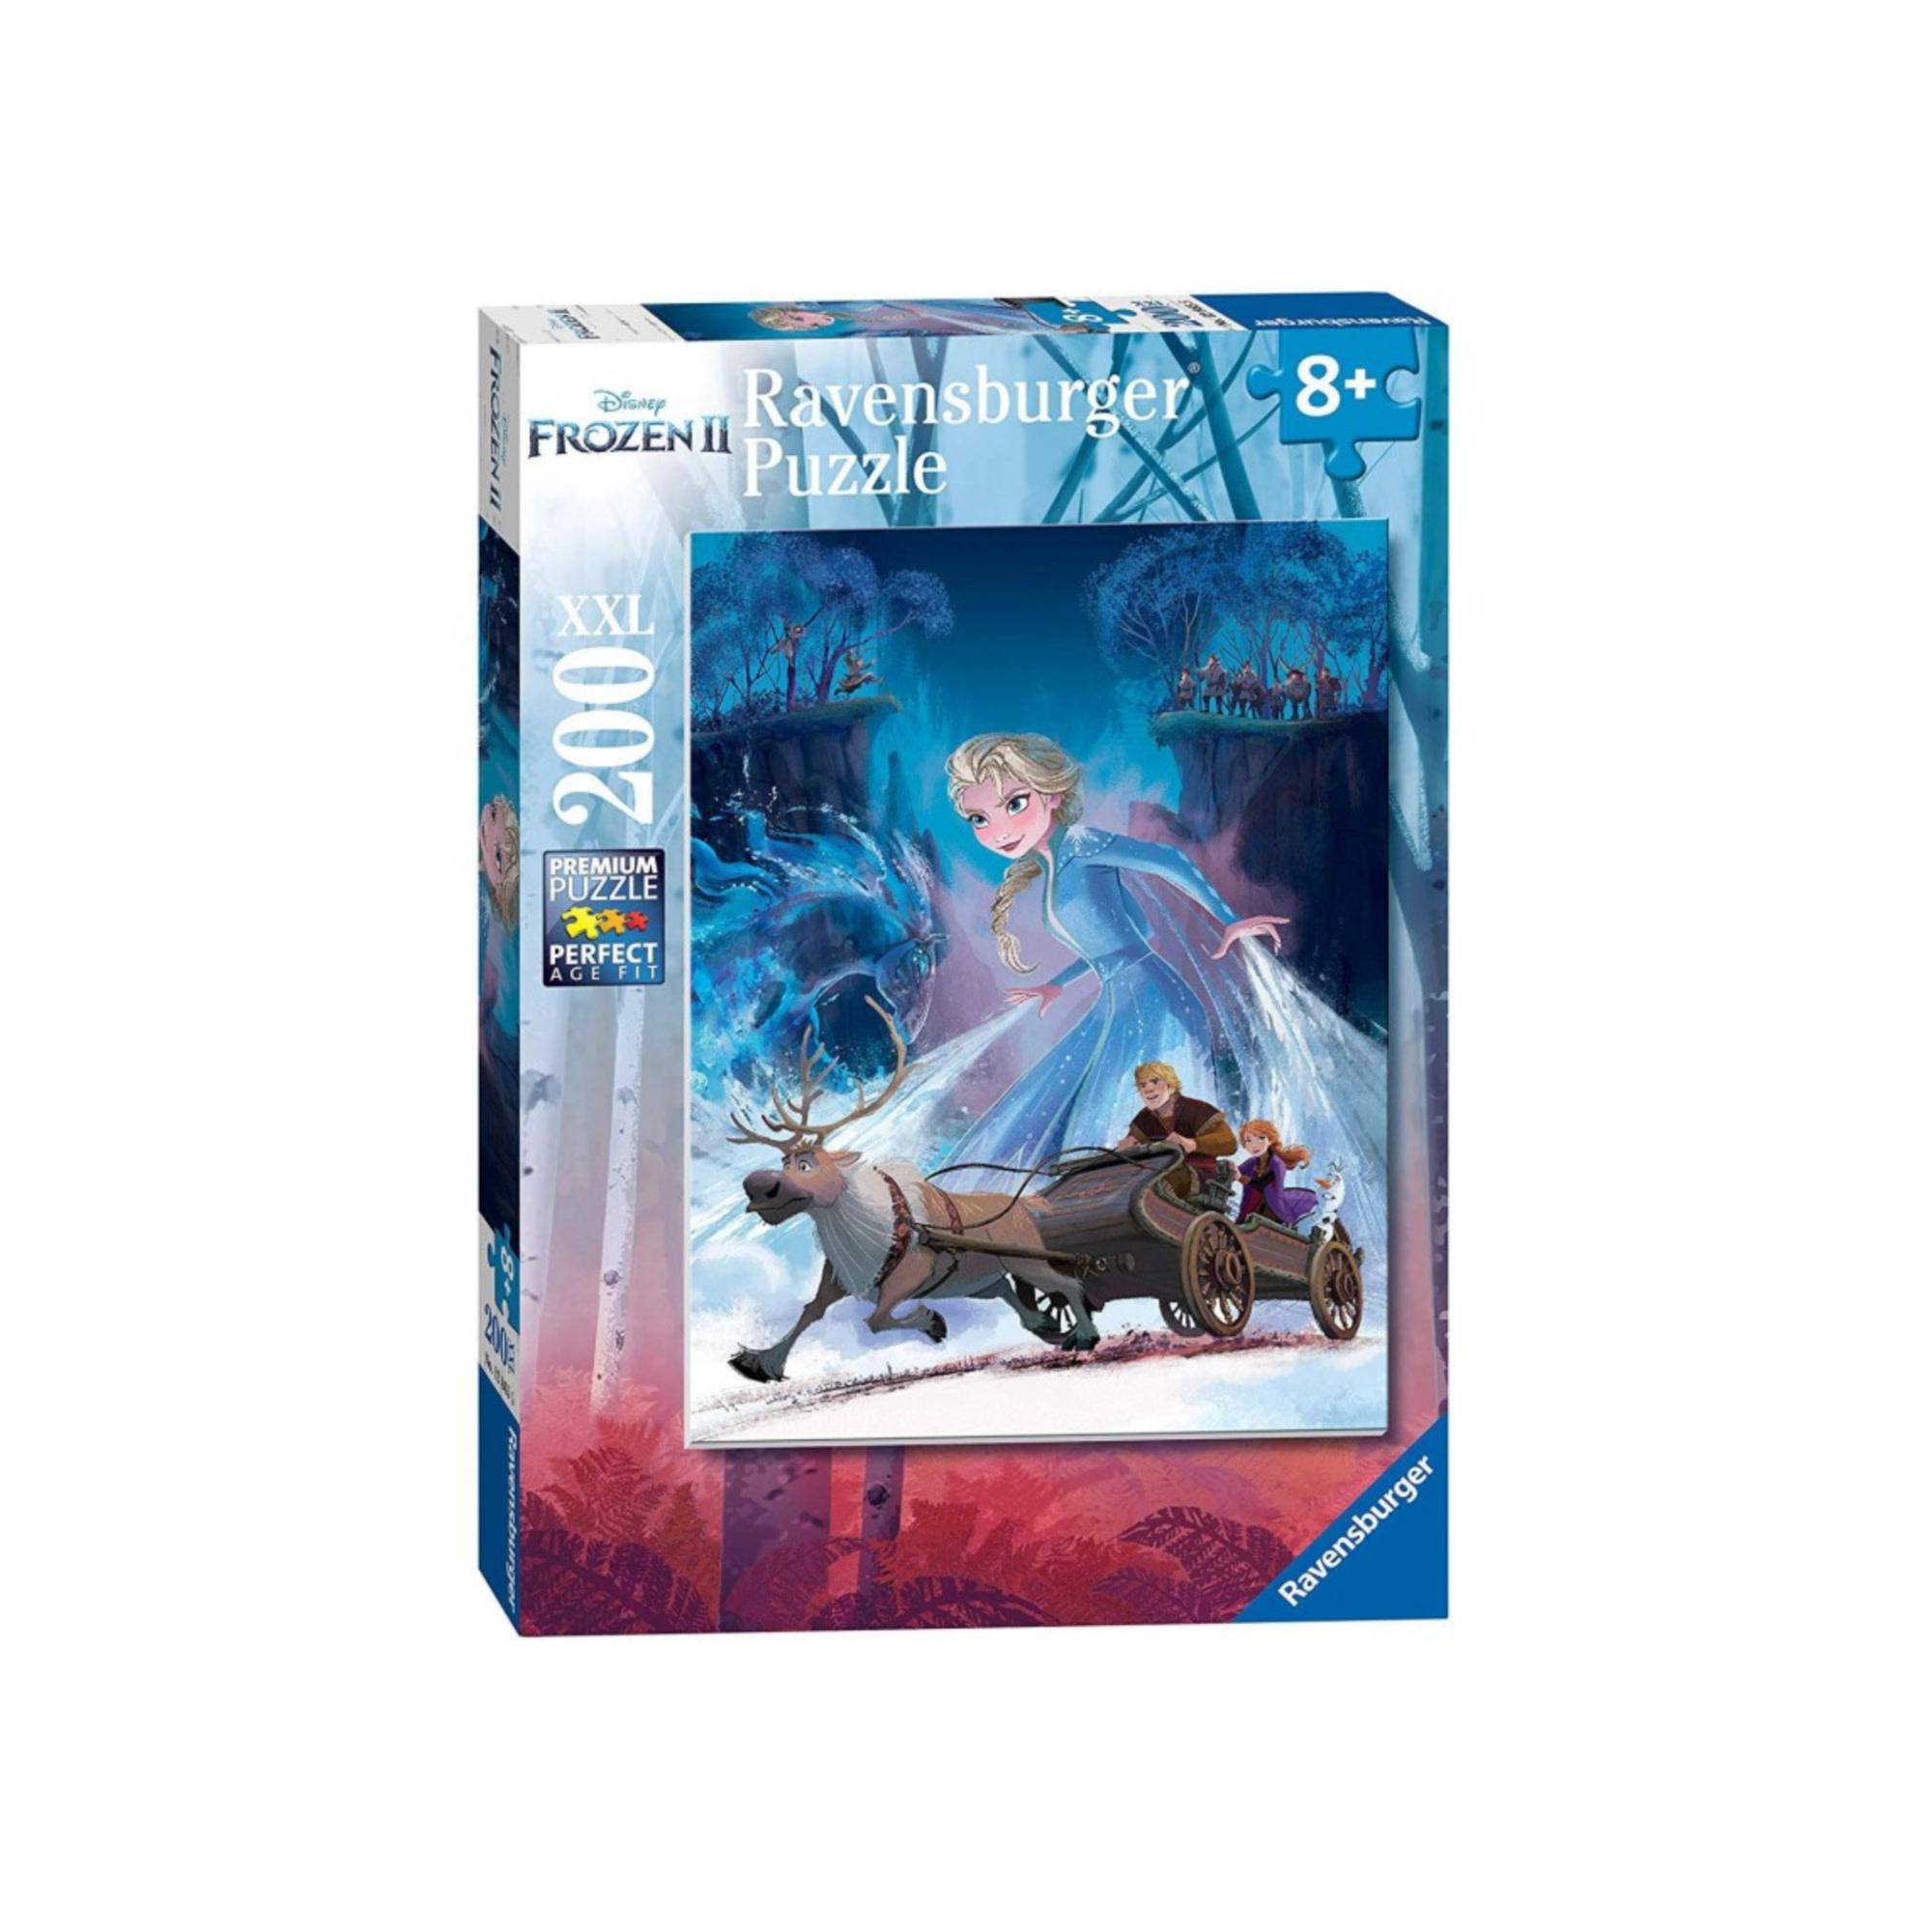 Ravensburger Puzzle XXL 200: Frozen II